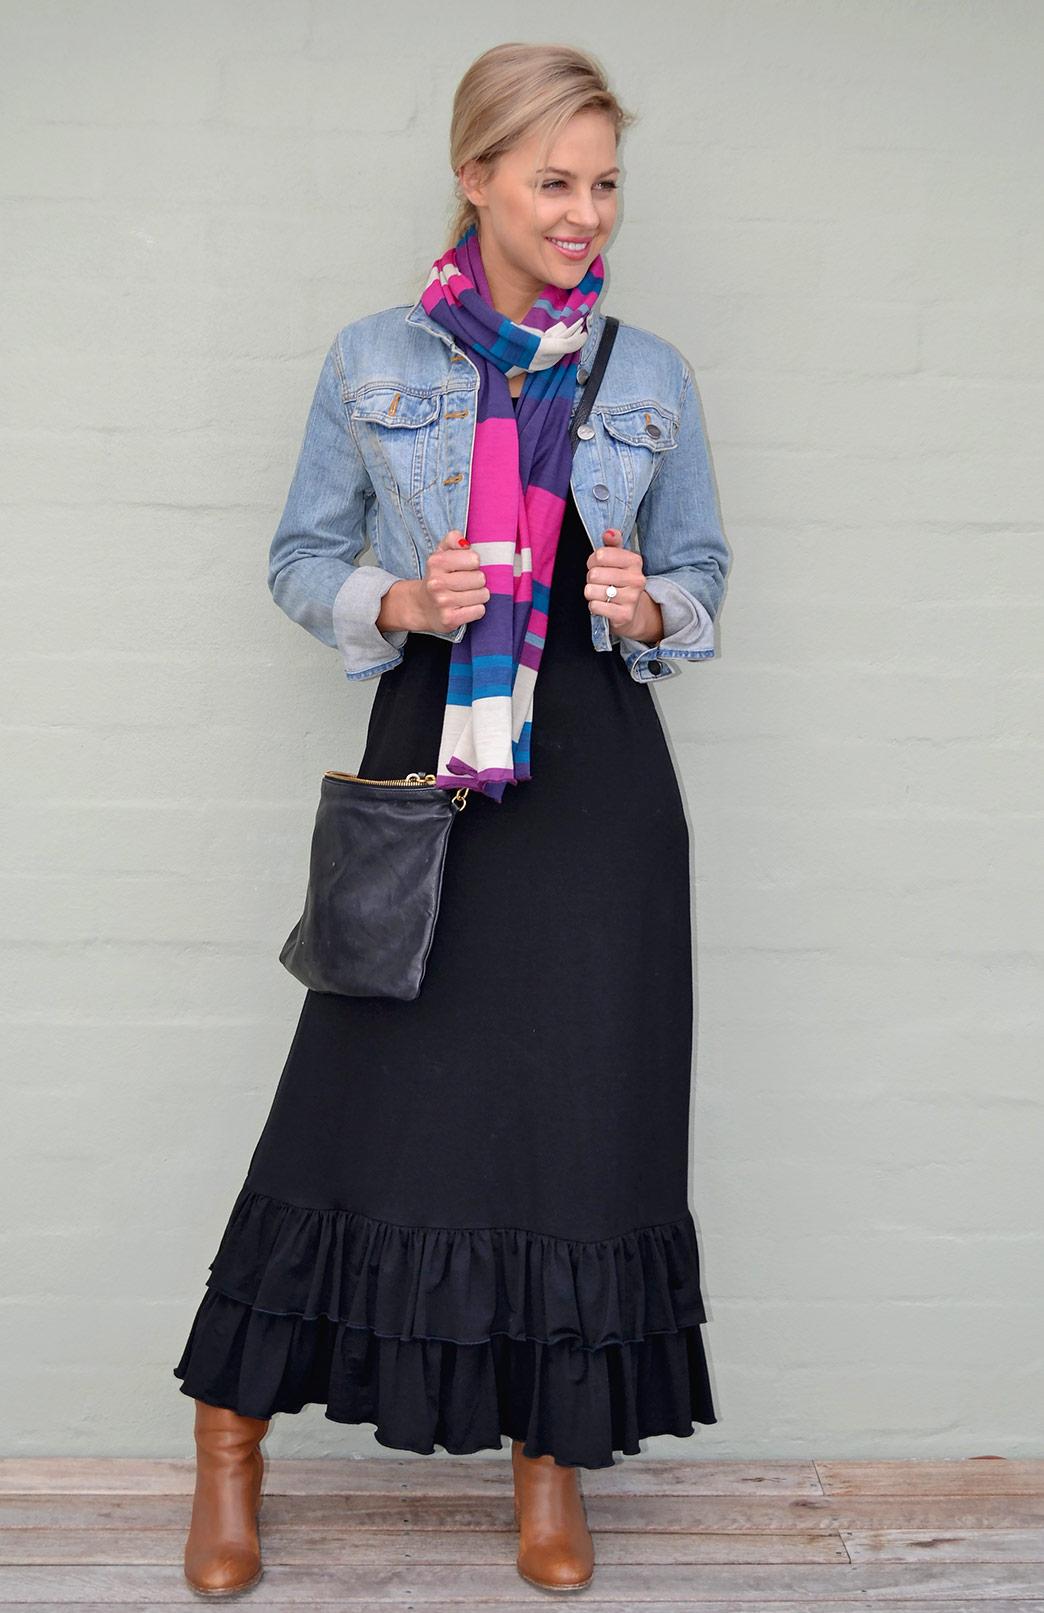 Sofia Maxi Dress - Women's Black Merino Wool Sleeveless Summer Maxi Dress with Ruffle - Smitten Merino Tasmania Australia